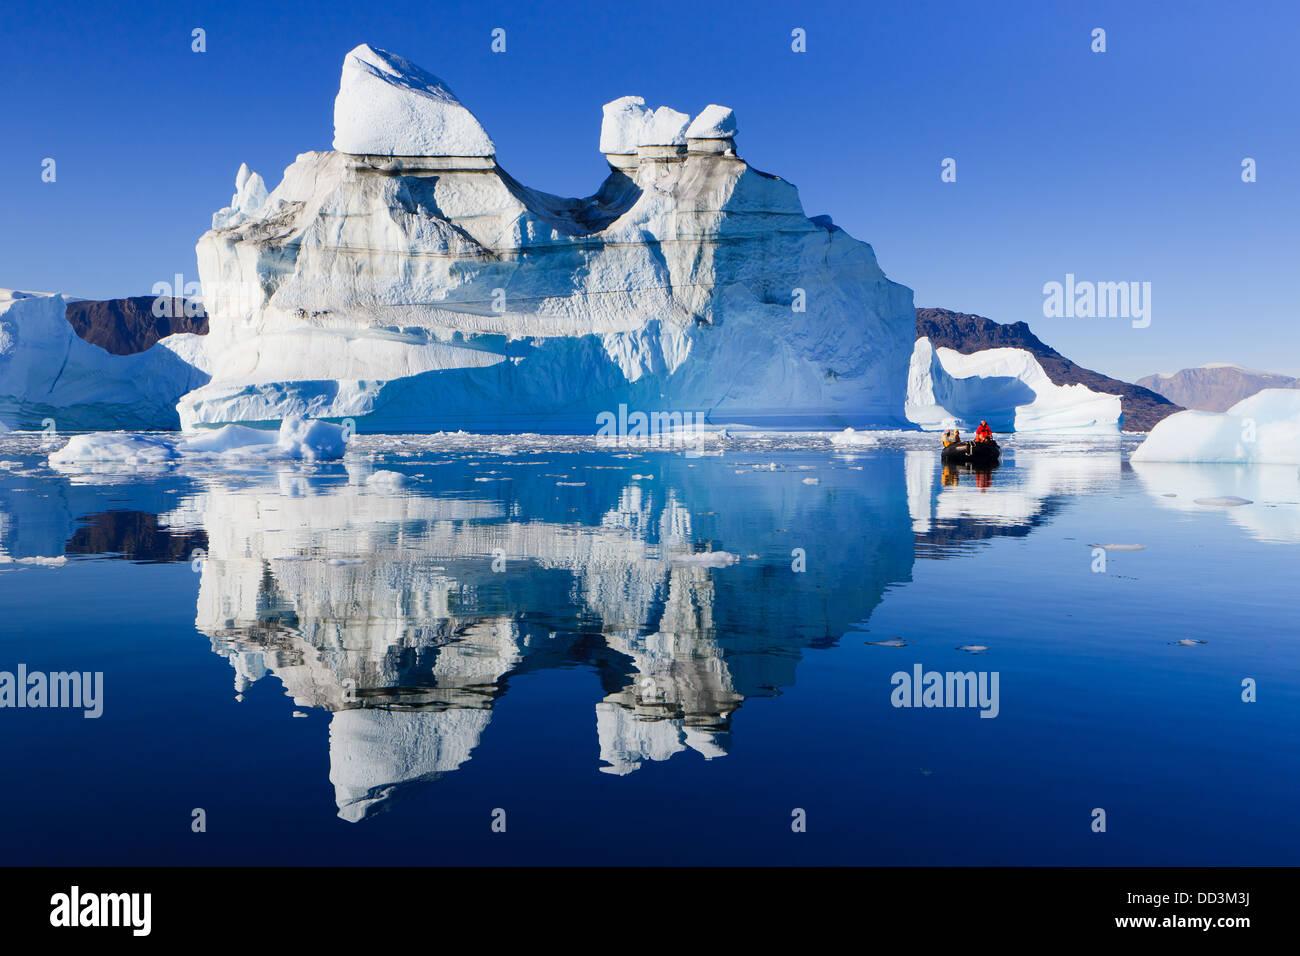 Cruising between the icebergs at Røde Ø, Scoresby sund, Greenland - Stock Image